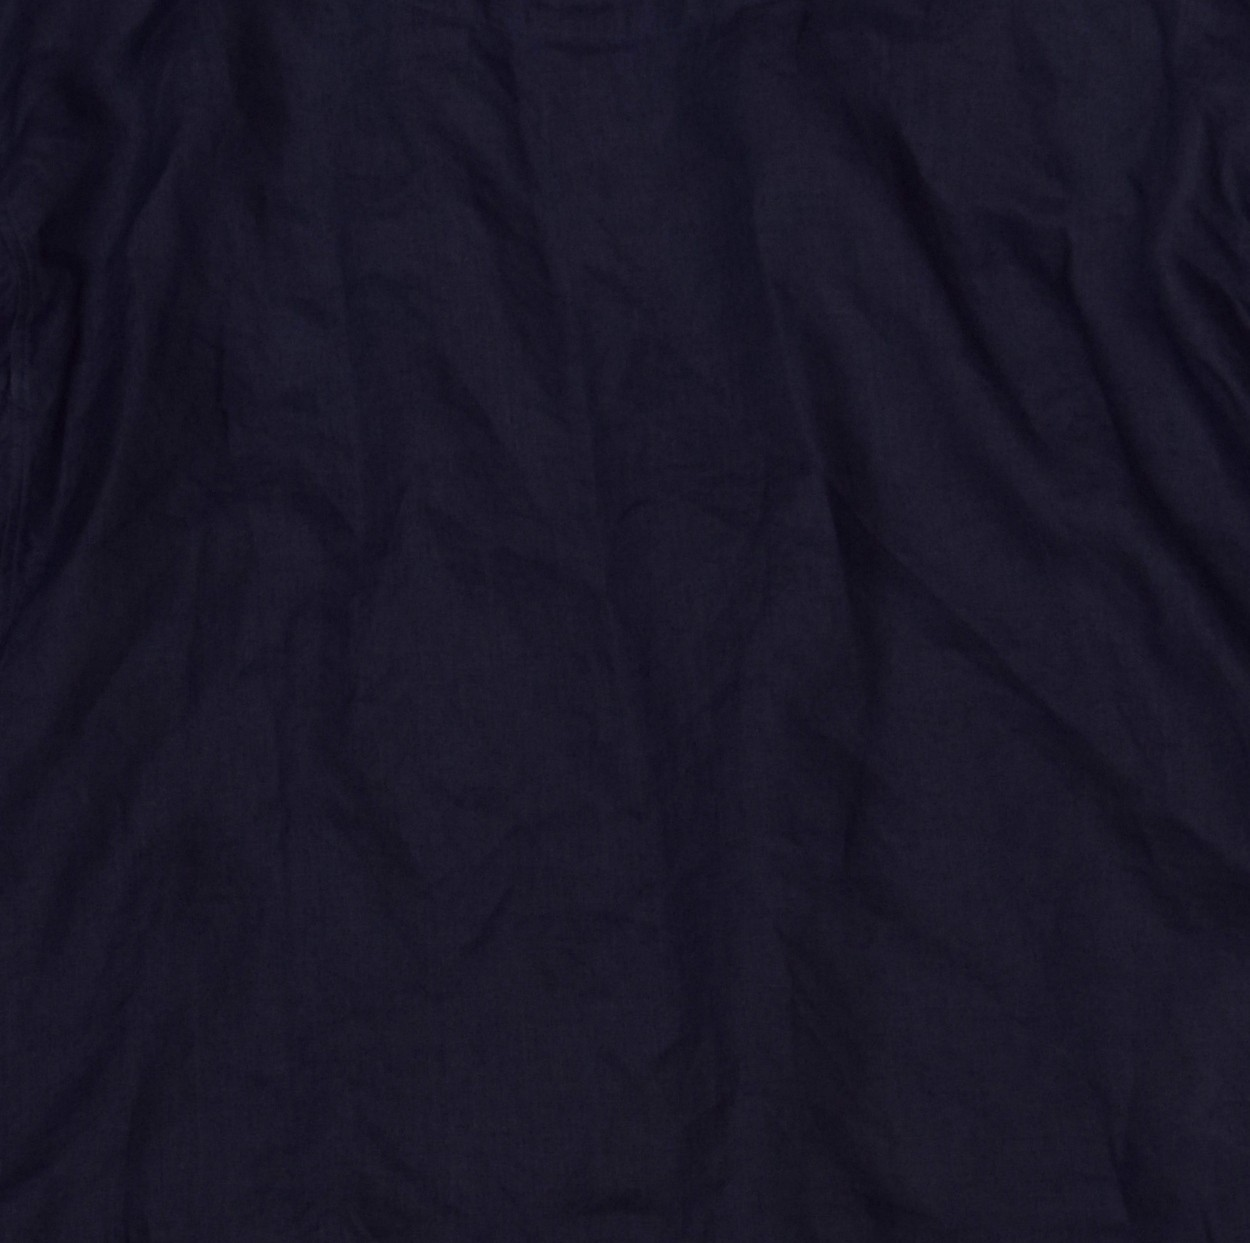 75 -navy linen